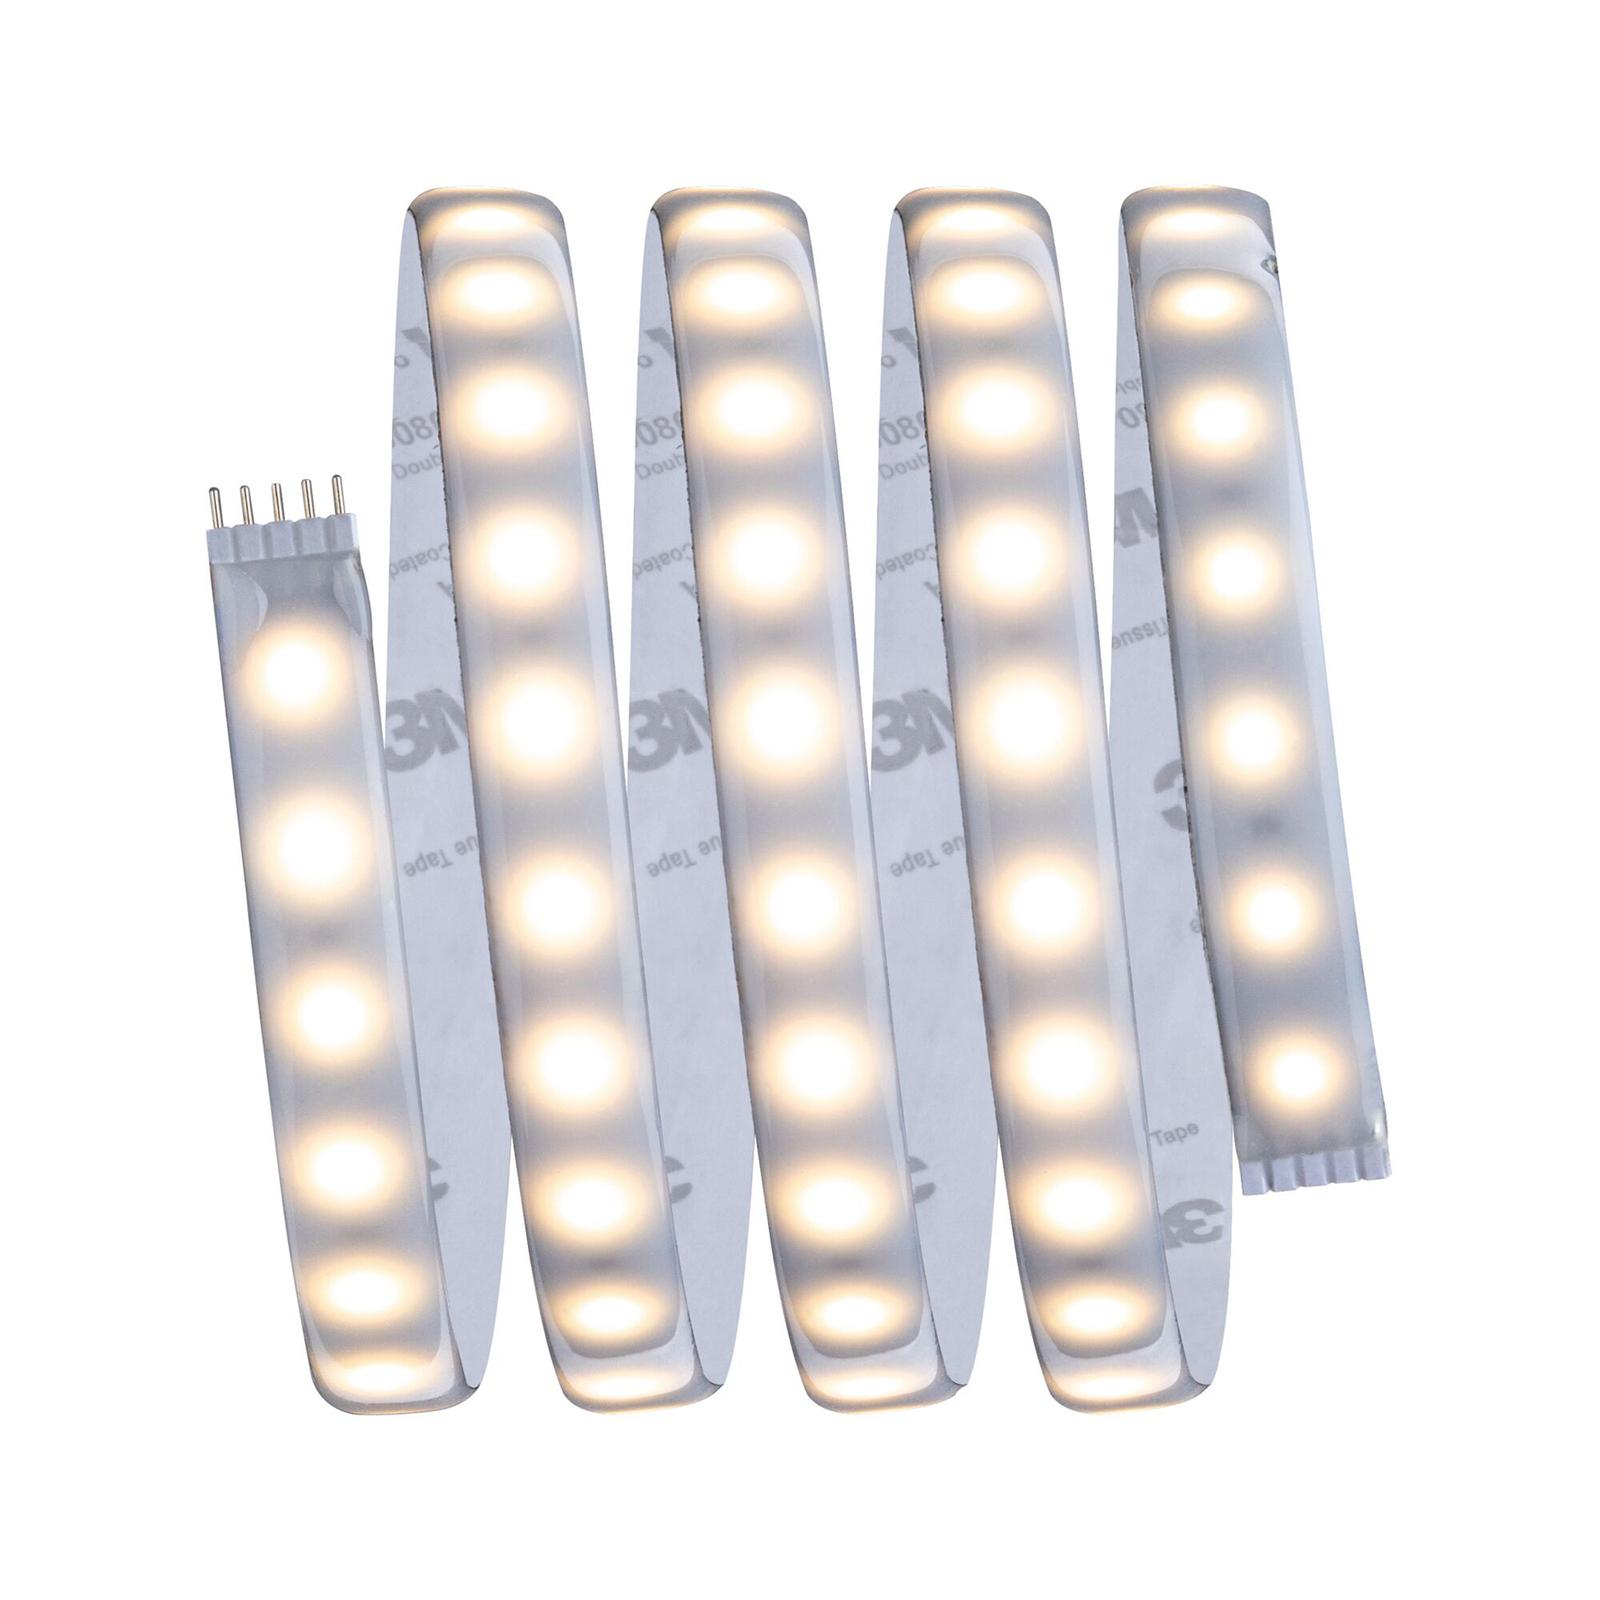 Grunnpakke MaxLED LED-stripe 150 cm hvit justerbar